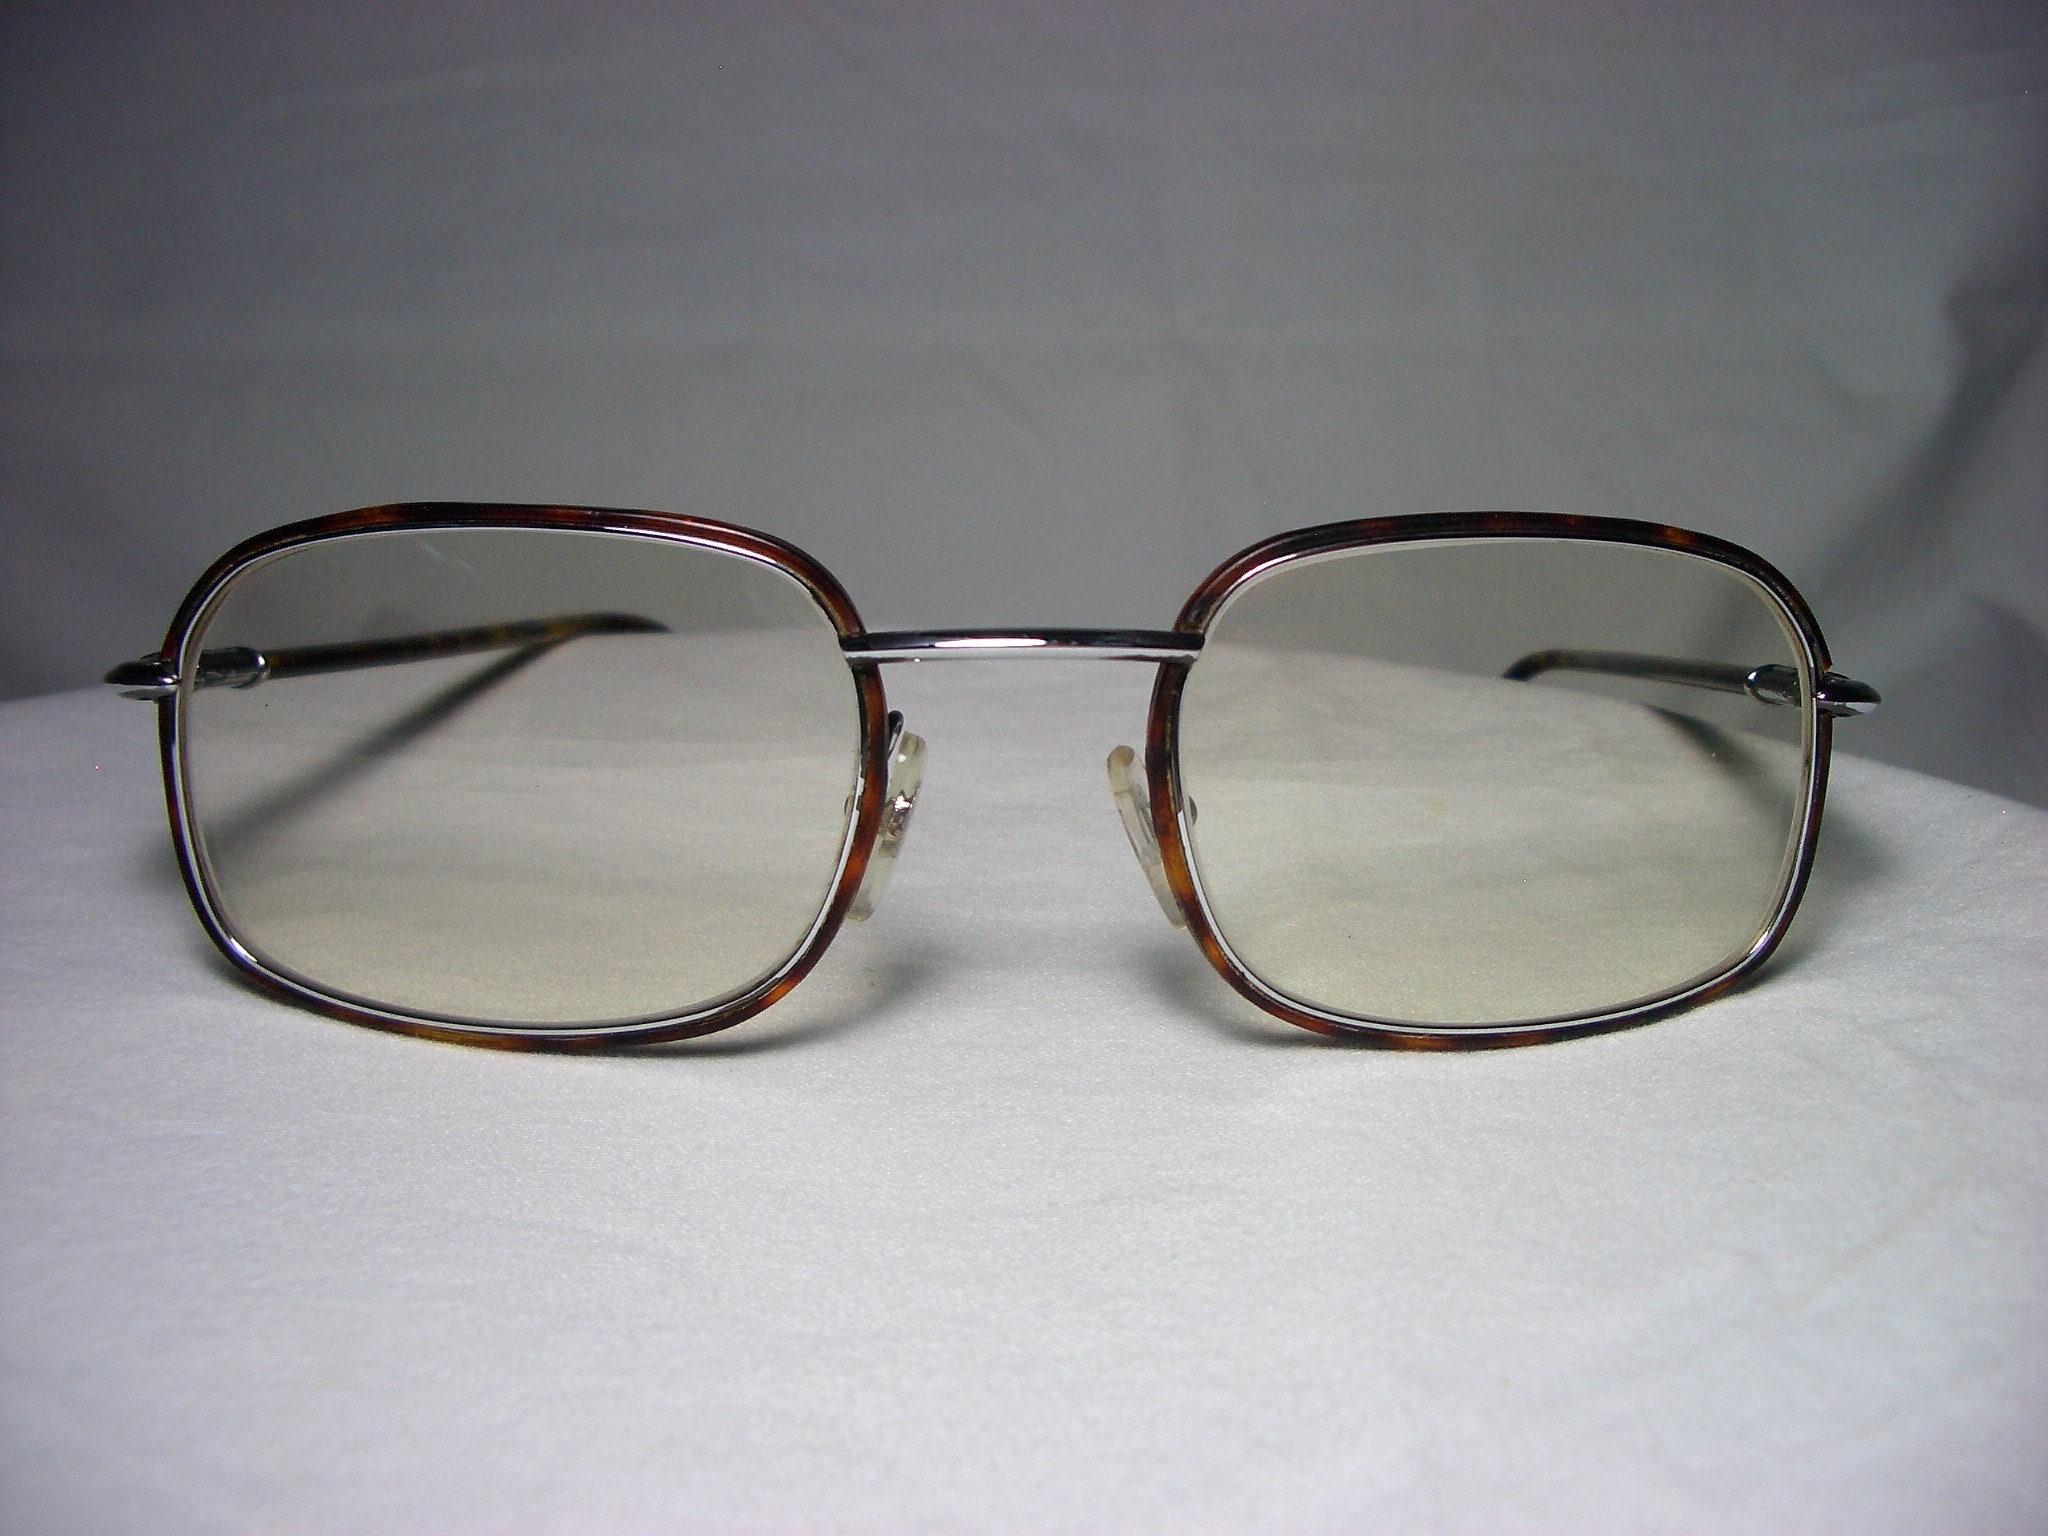 5b8112bf800 Christian Dior Monsieur Silver square oval eyeglasses